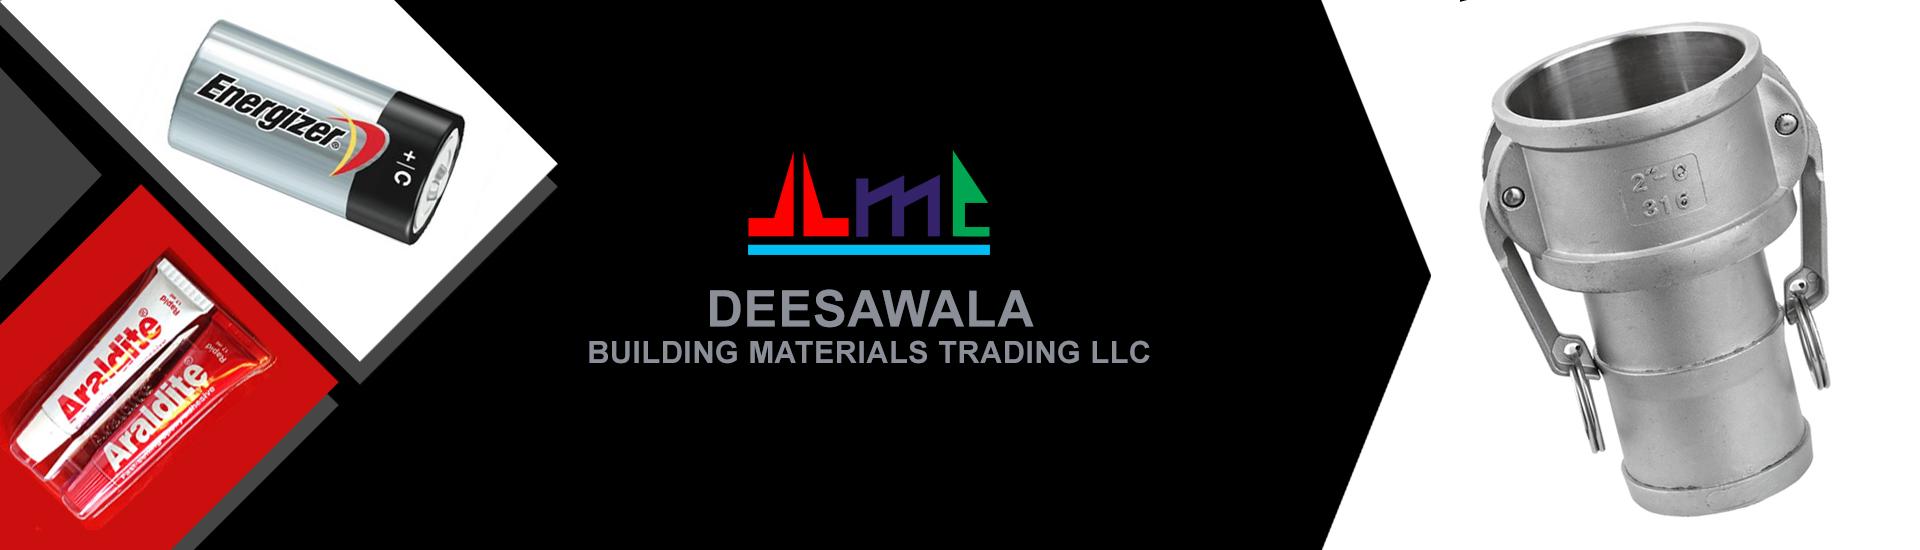 DEESAWALA BUILDING MATERIALS TRADING LLC